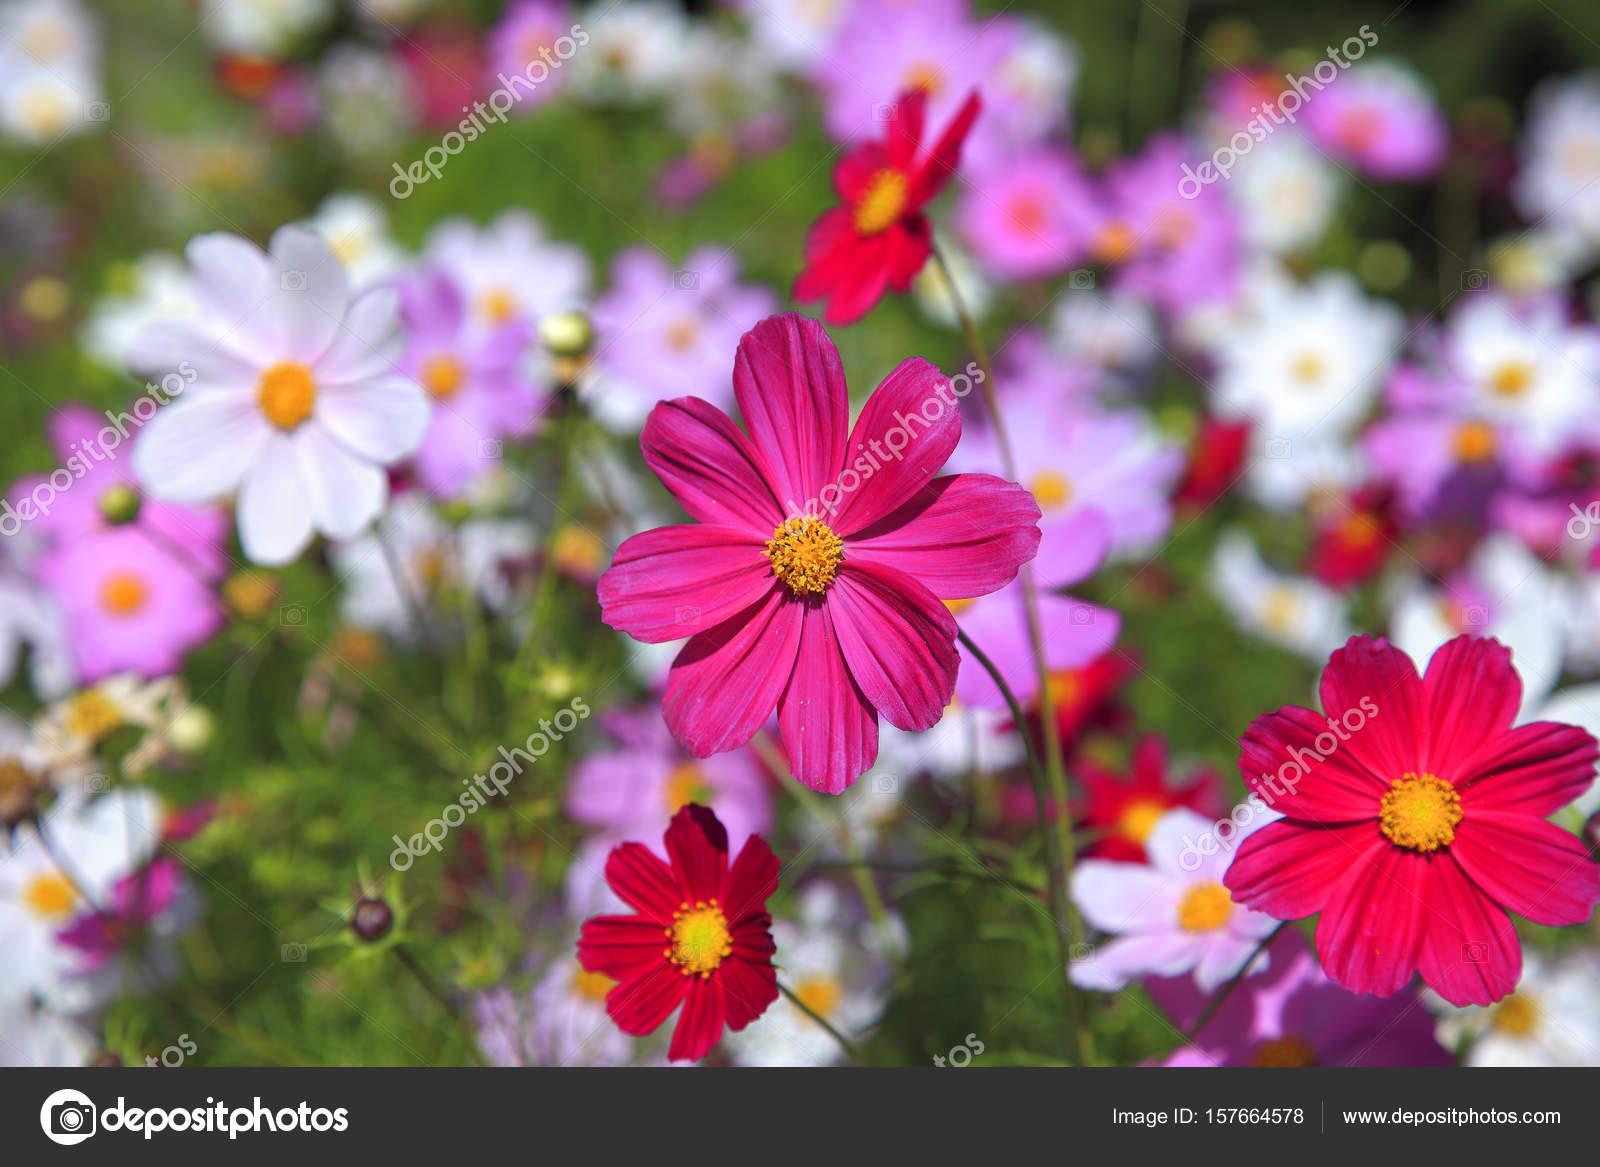 Beautiful daisy flowers stock photo topphoto 157664578 beautiful daisy flowers close up photo by topphoto izmirmasajfo